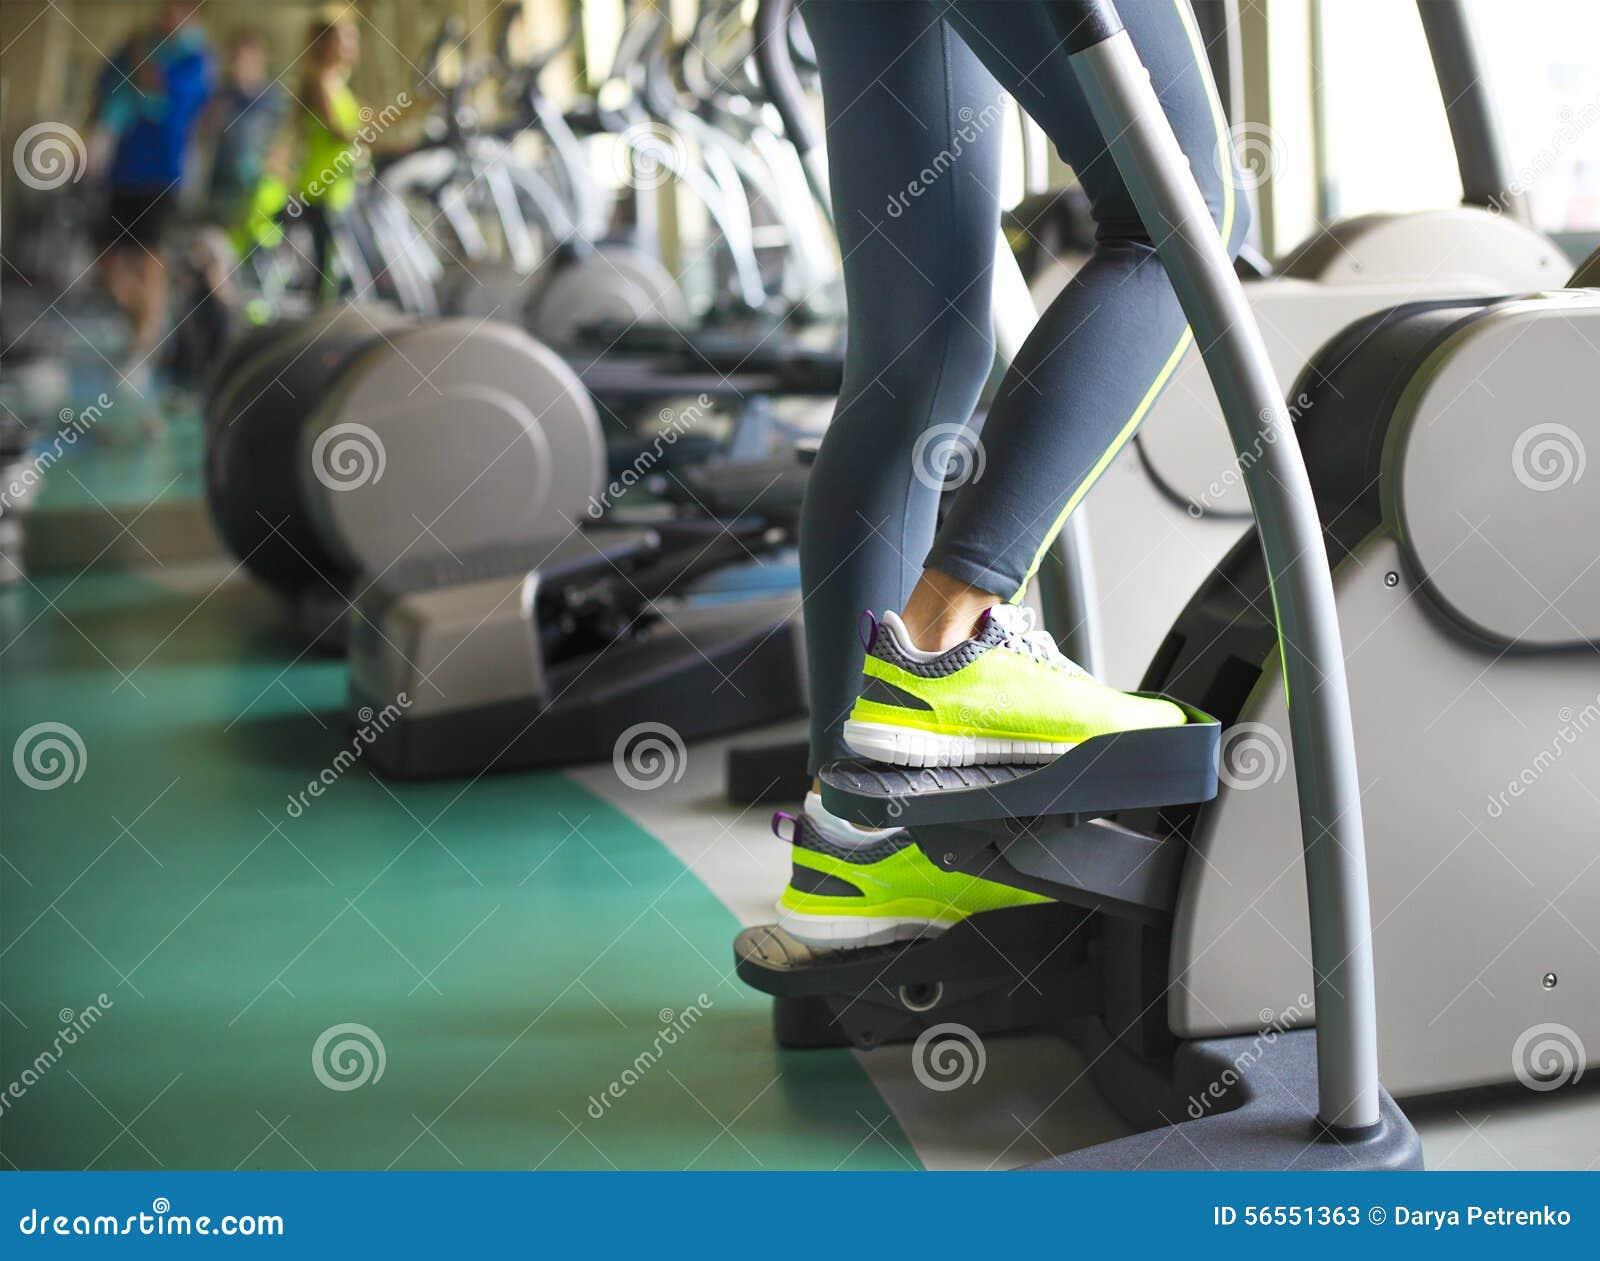 Download Νέες φίλαθλες γυναίκες που κάνουν τις ασκήσεις στο κέντρο γυμναστικής Στοκ Εικόνα - εικόνα από μυϊκός, ανύψωση: 56551363